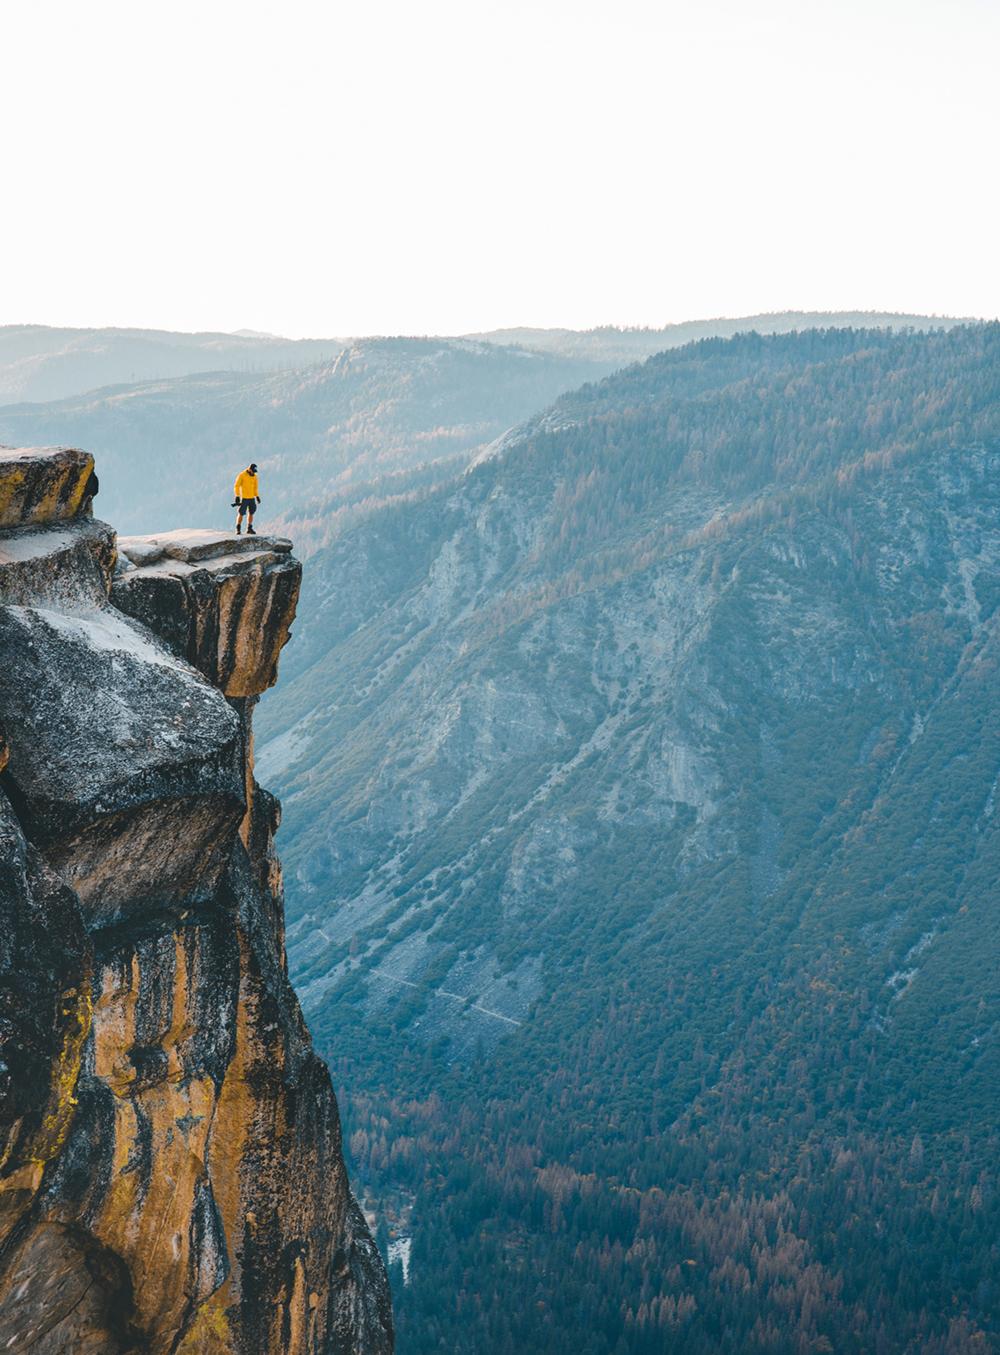 Taft Point, Yosemite National Park, Kalifornien, USA  Photo © 2018 Guerel Sahin / Palatina Media Gbr. All rights reserved. www.guerelsahin.com